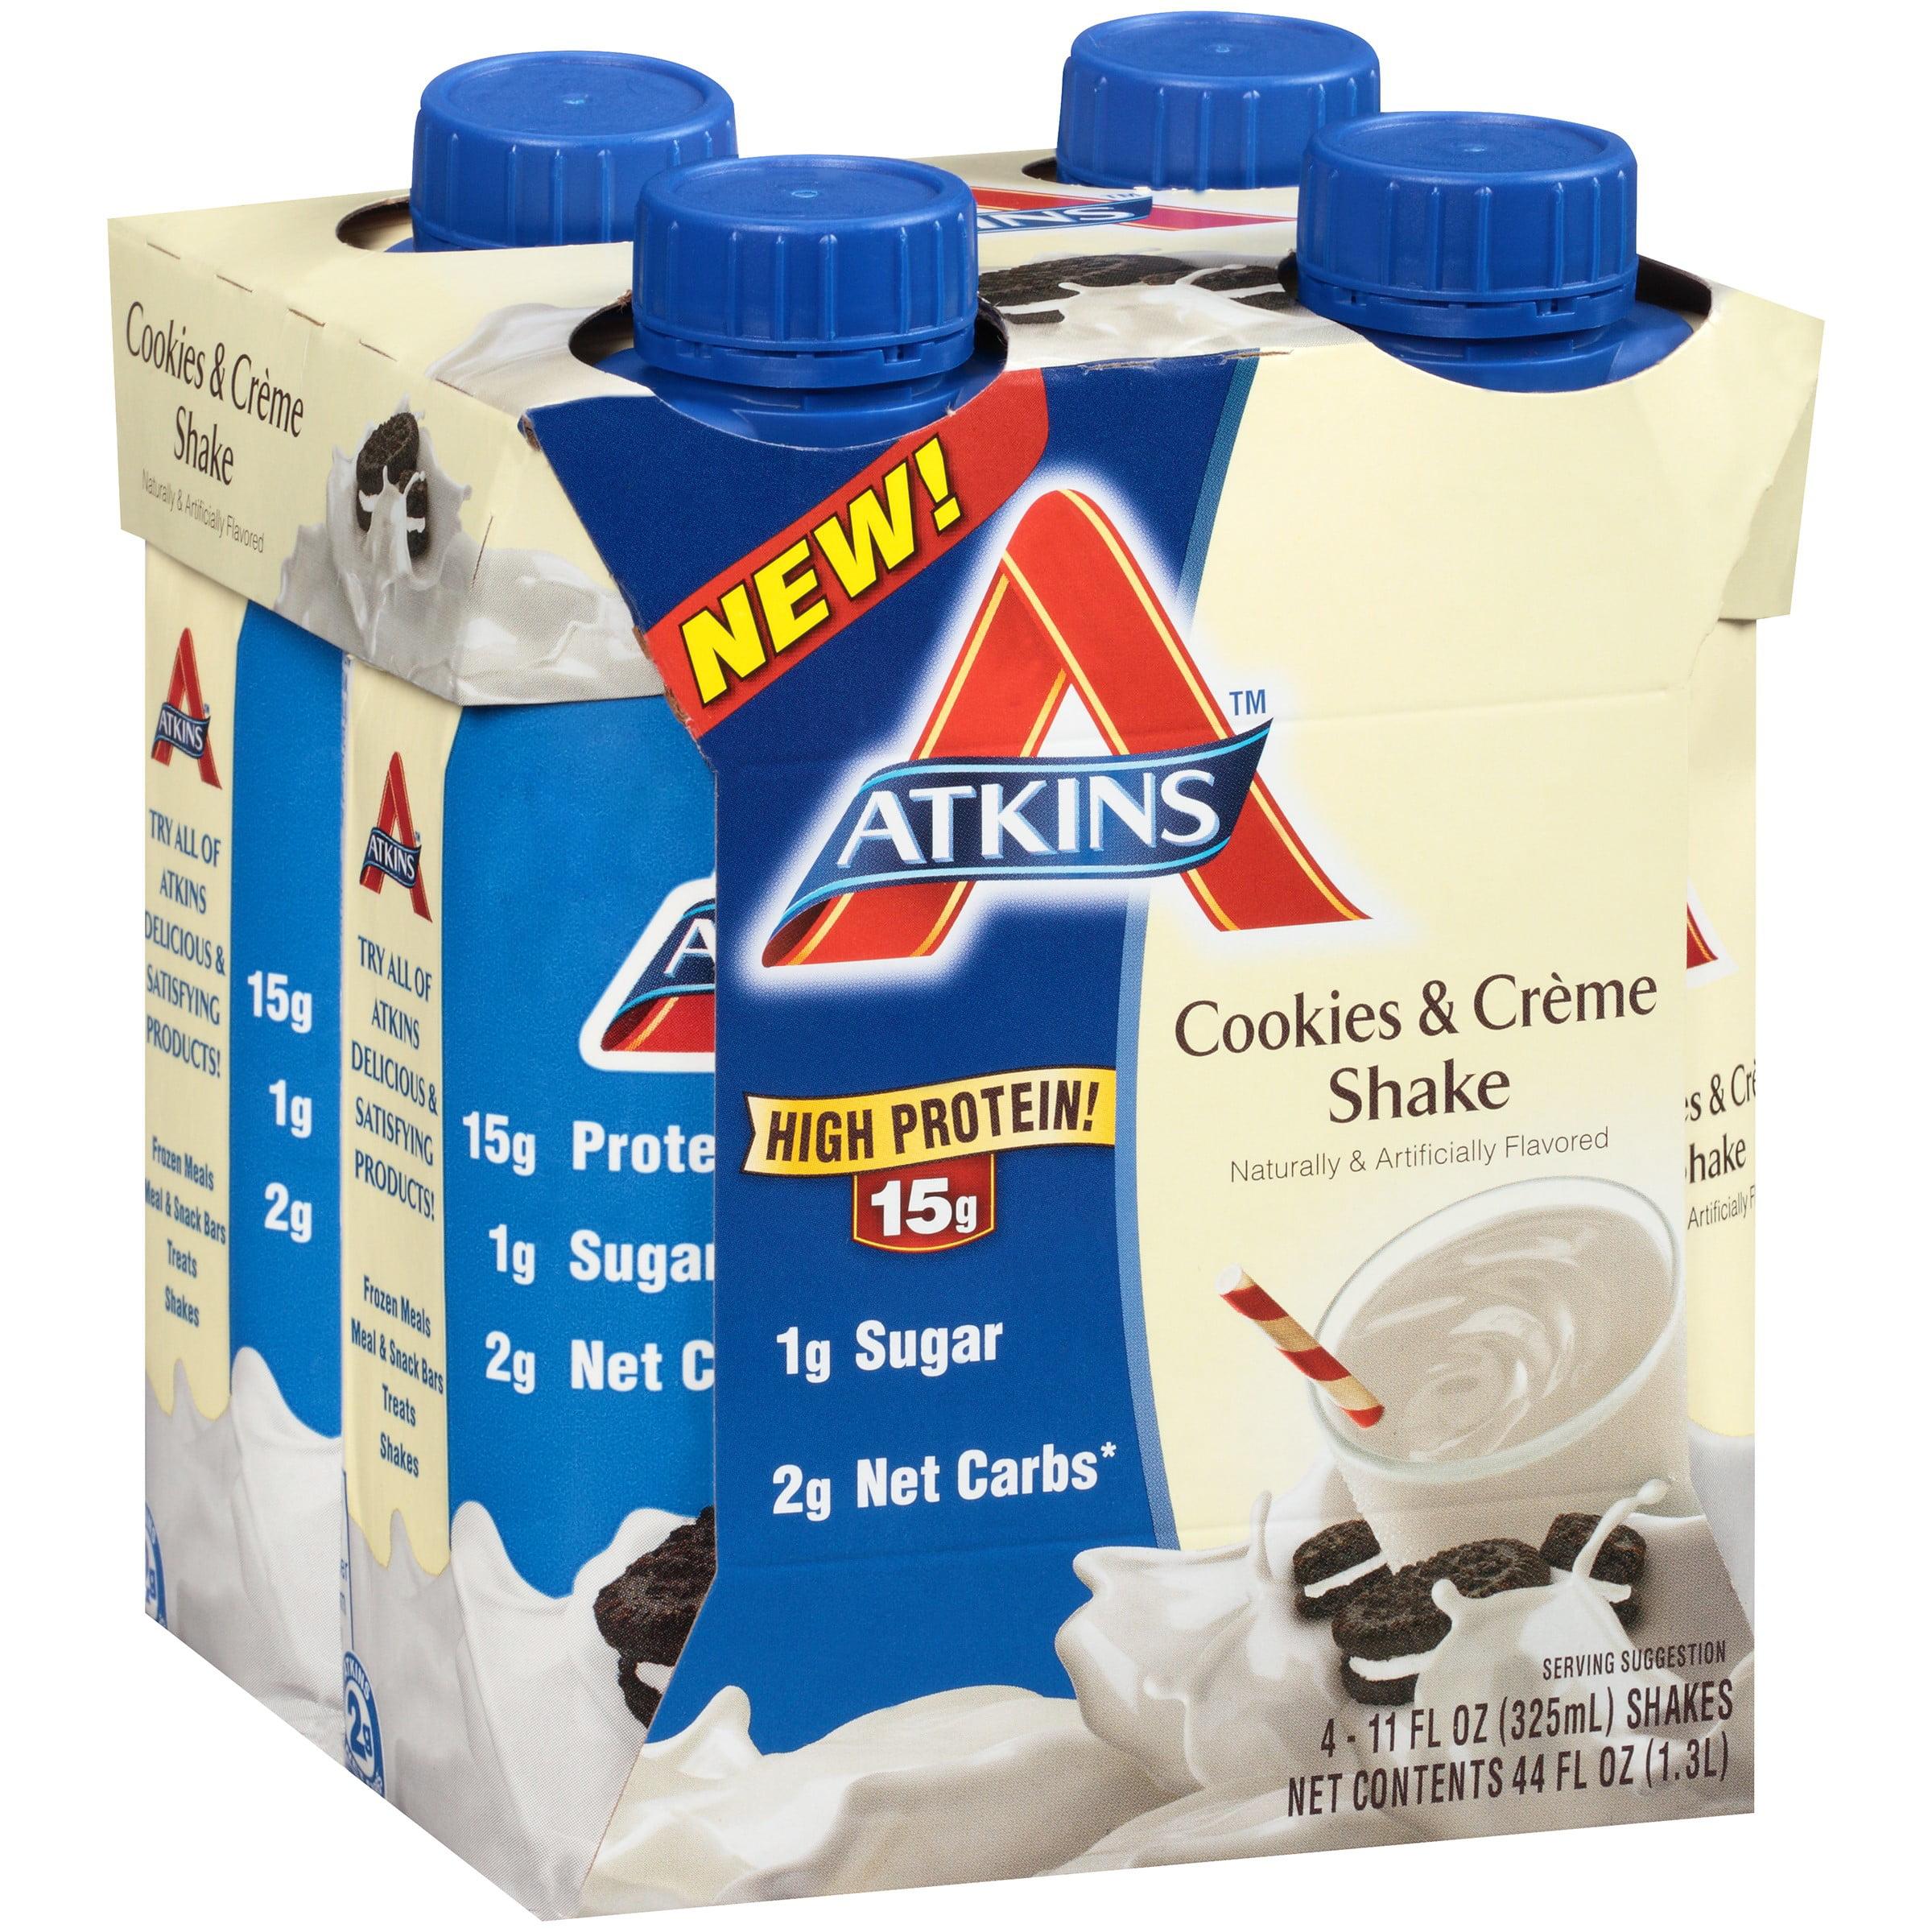 Atkins Cookies & Cream Shakes, 11 Fl oz, 4 Ct